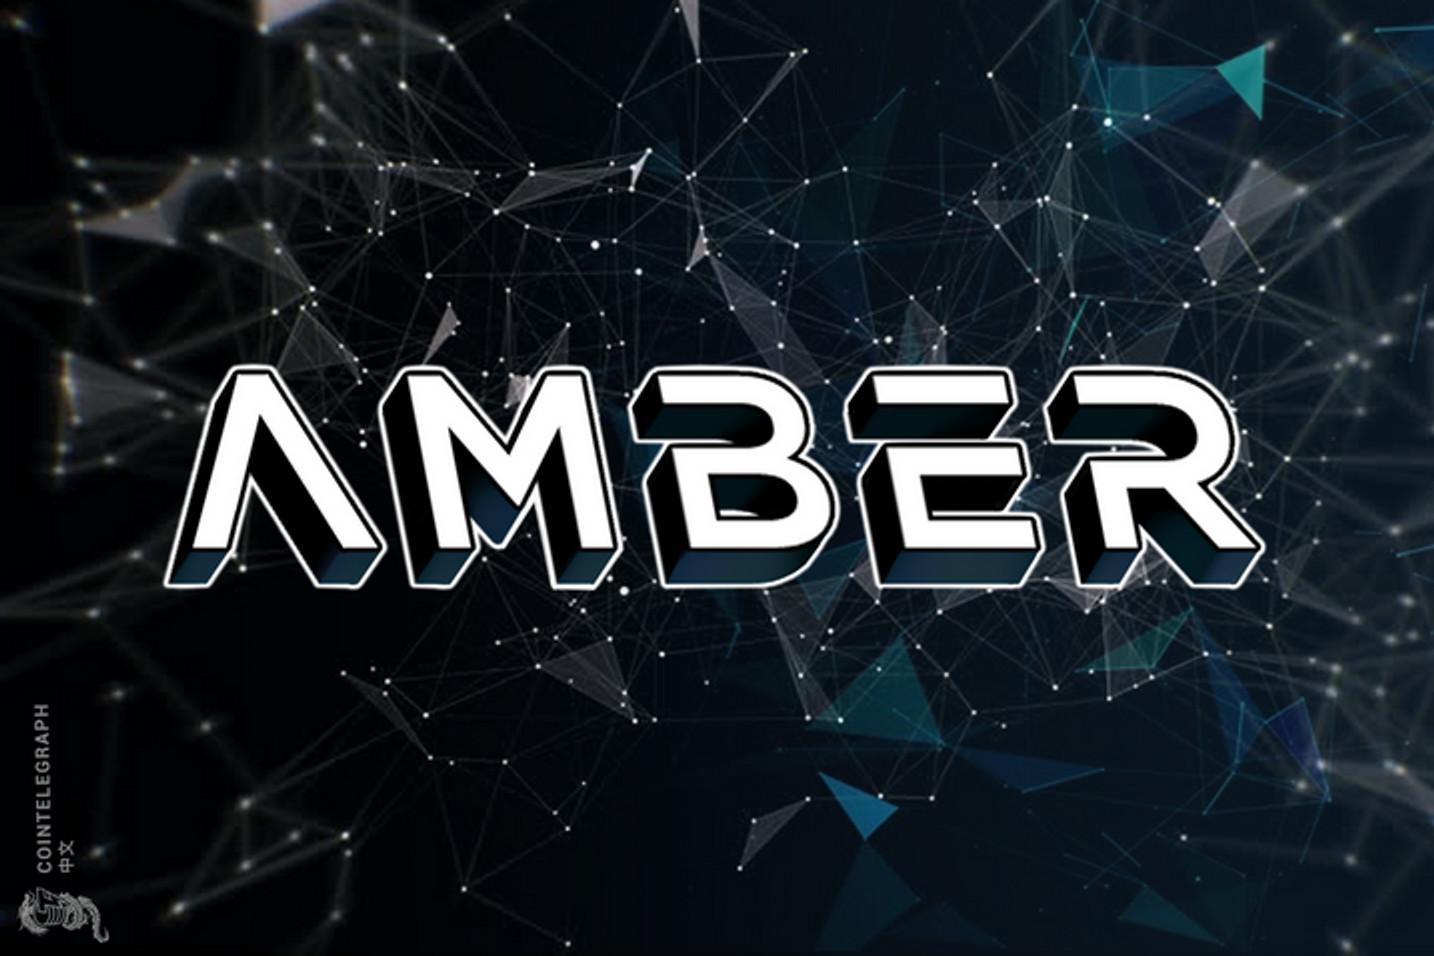 Amber Group年度业绩公布:资管规模5.3亿美元,总交易额2500亿美元